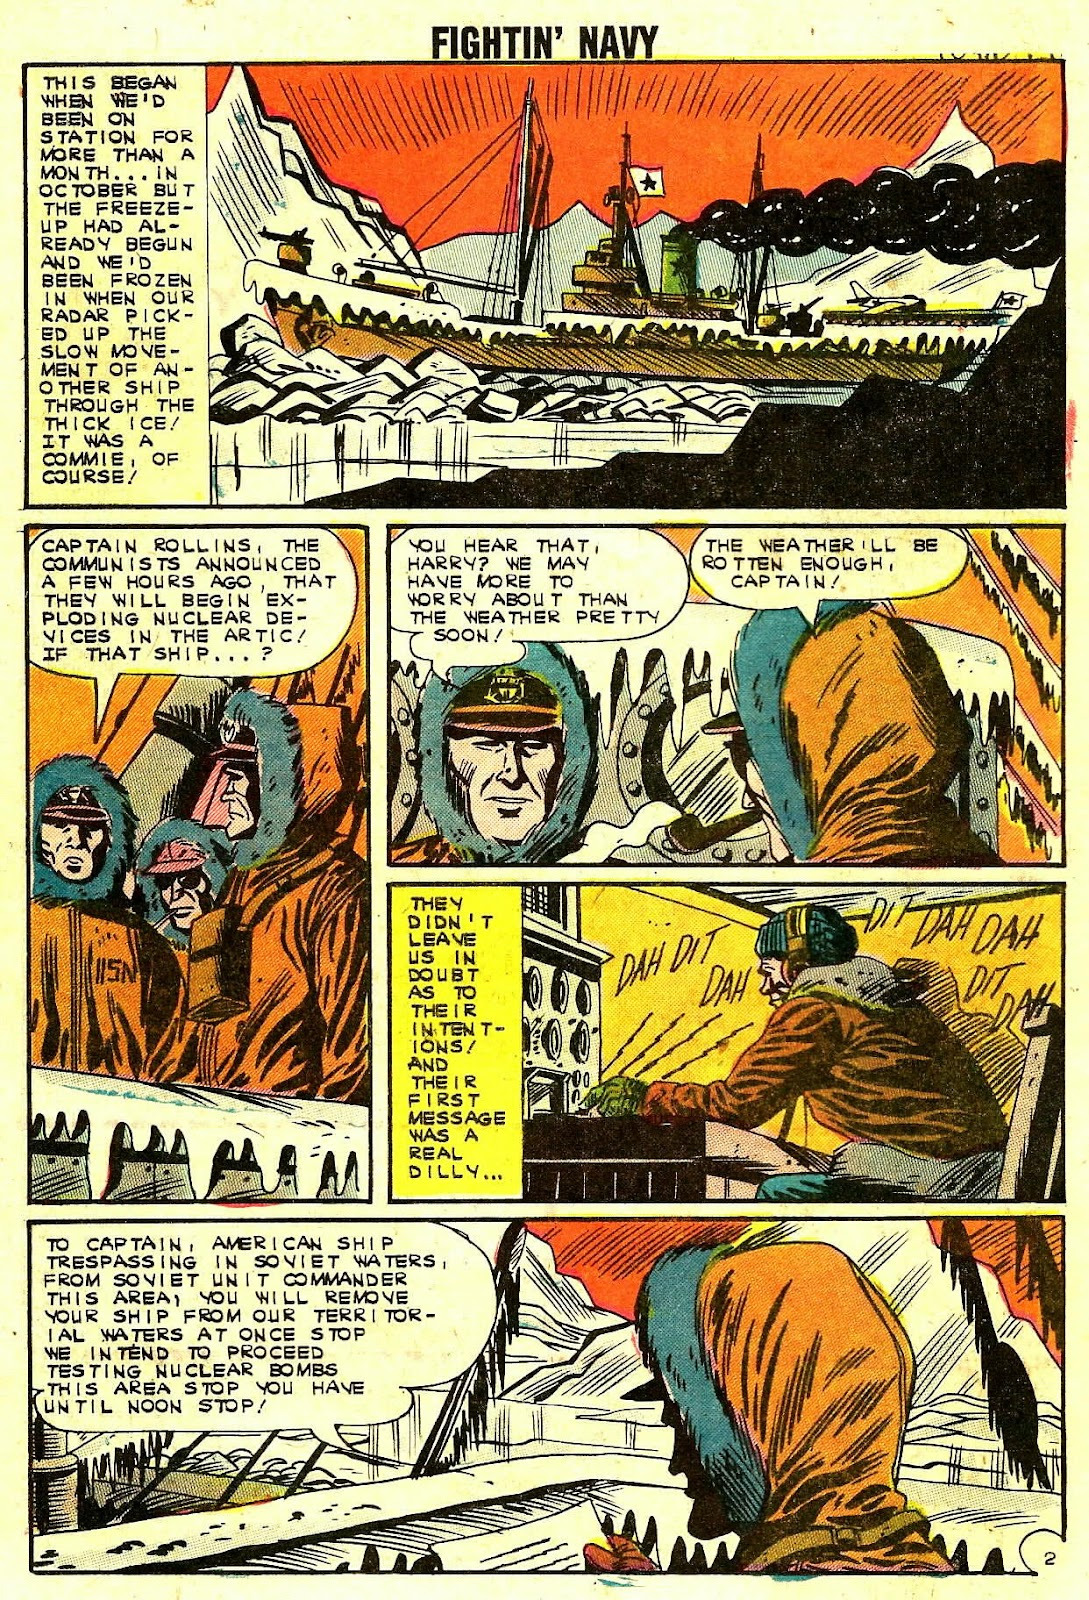 Read online Fightin' Navy comic -  Issue #109 - 16